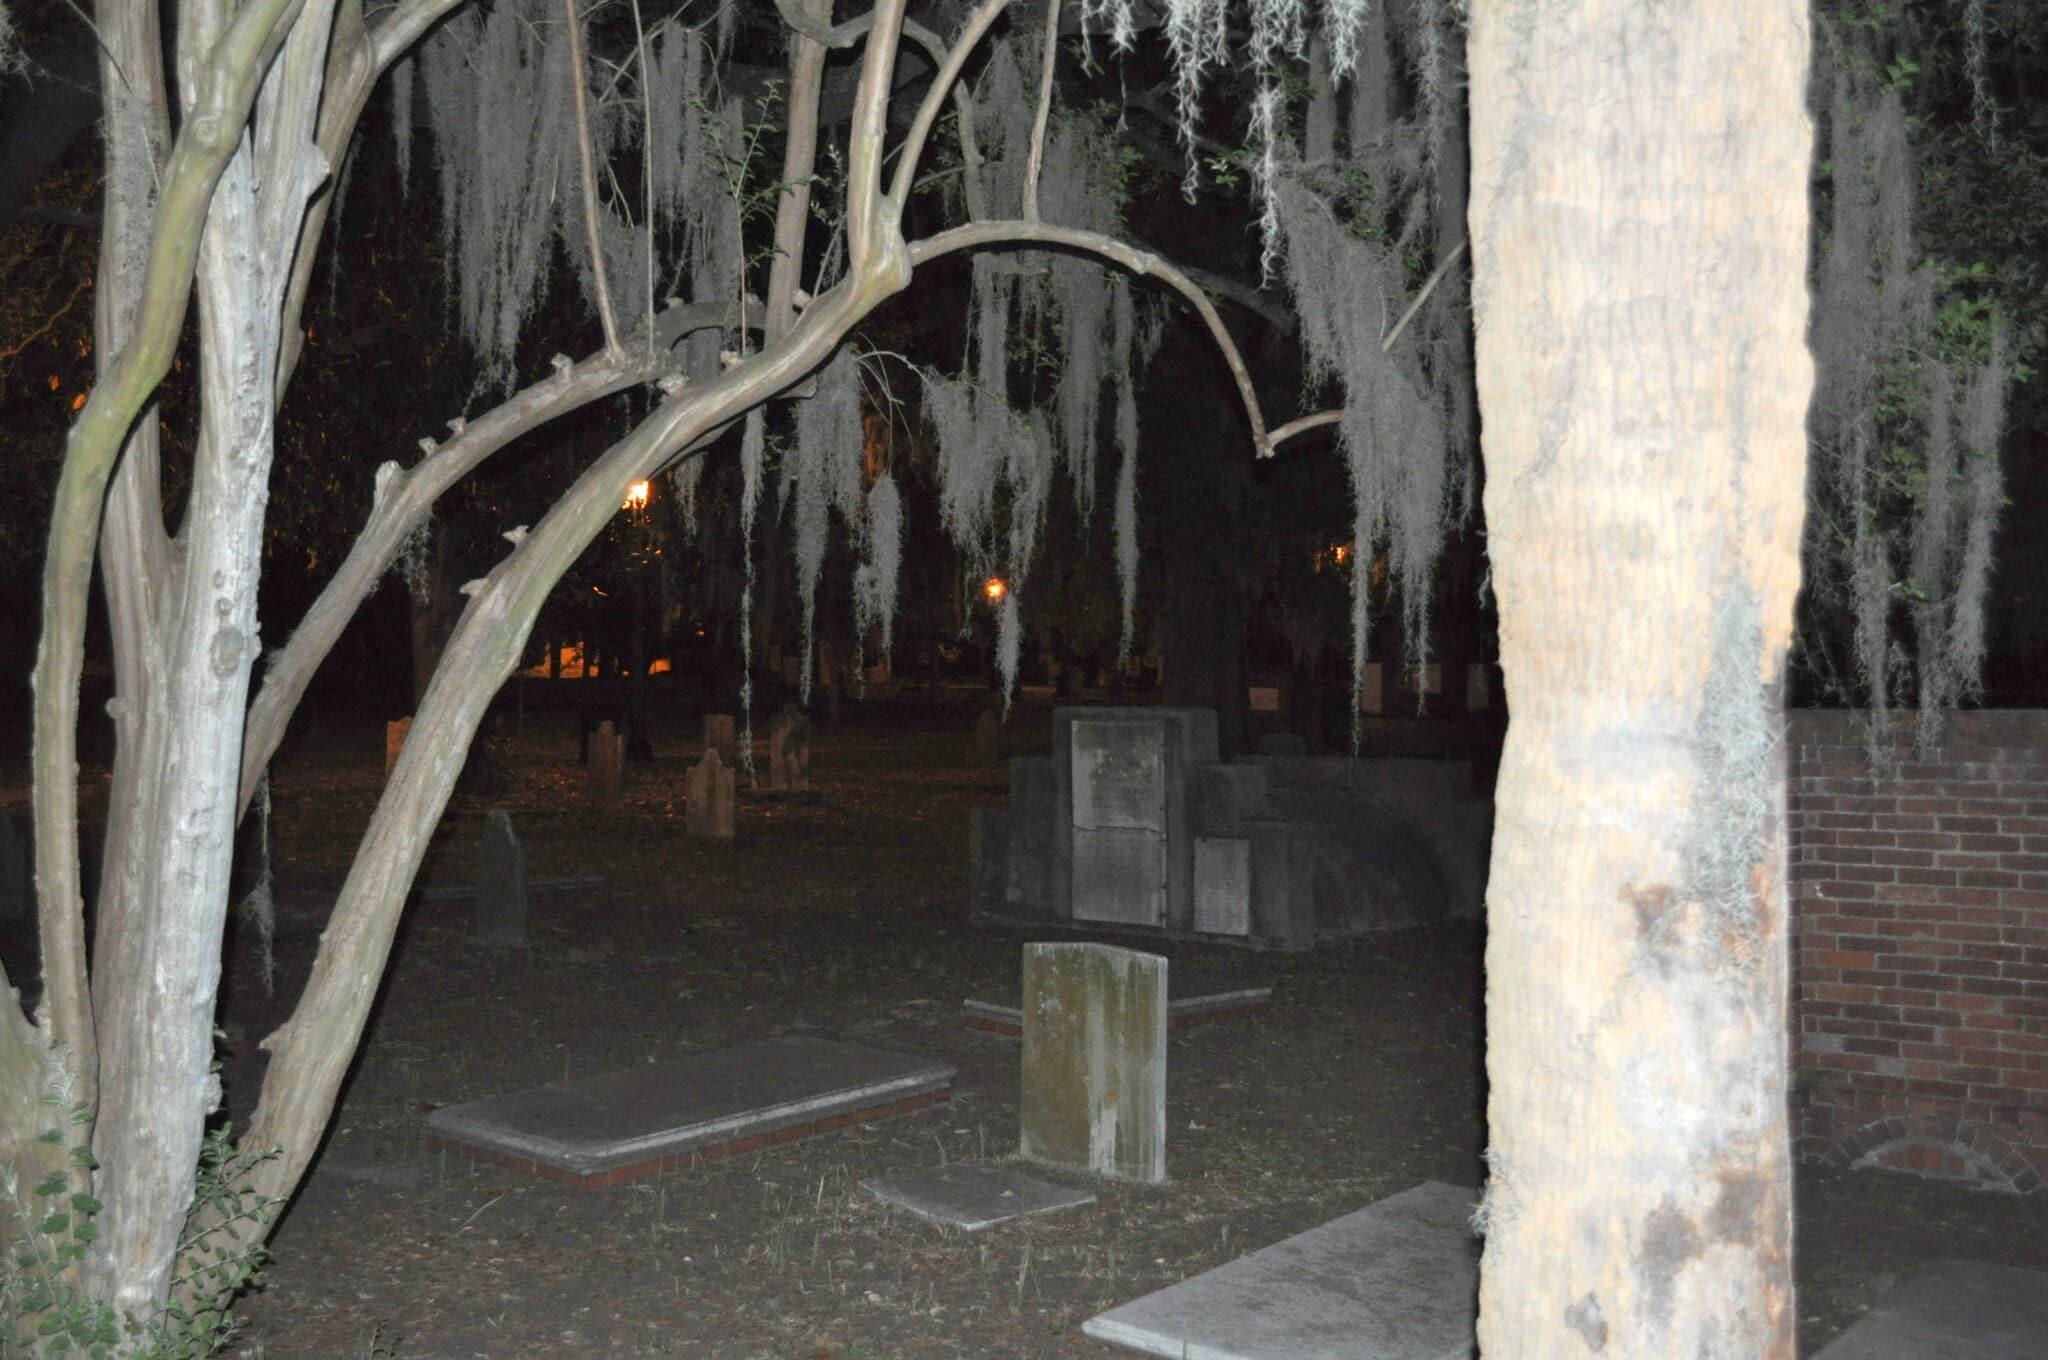 Colonial Park Cemetery Savannah, GA madeinaday.com